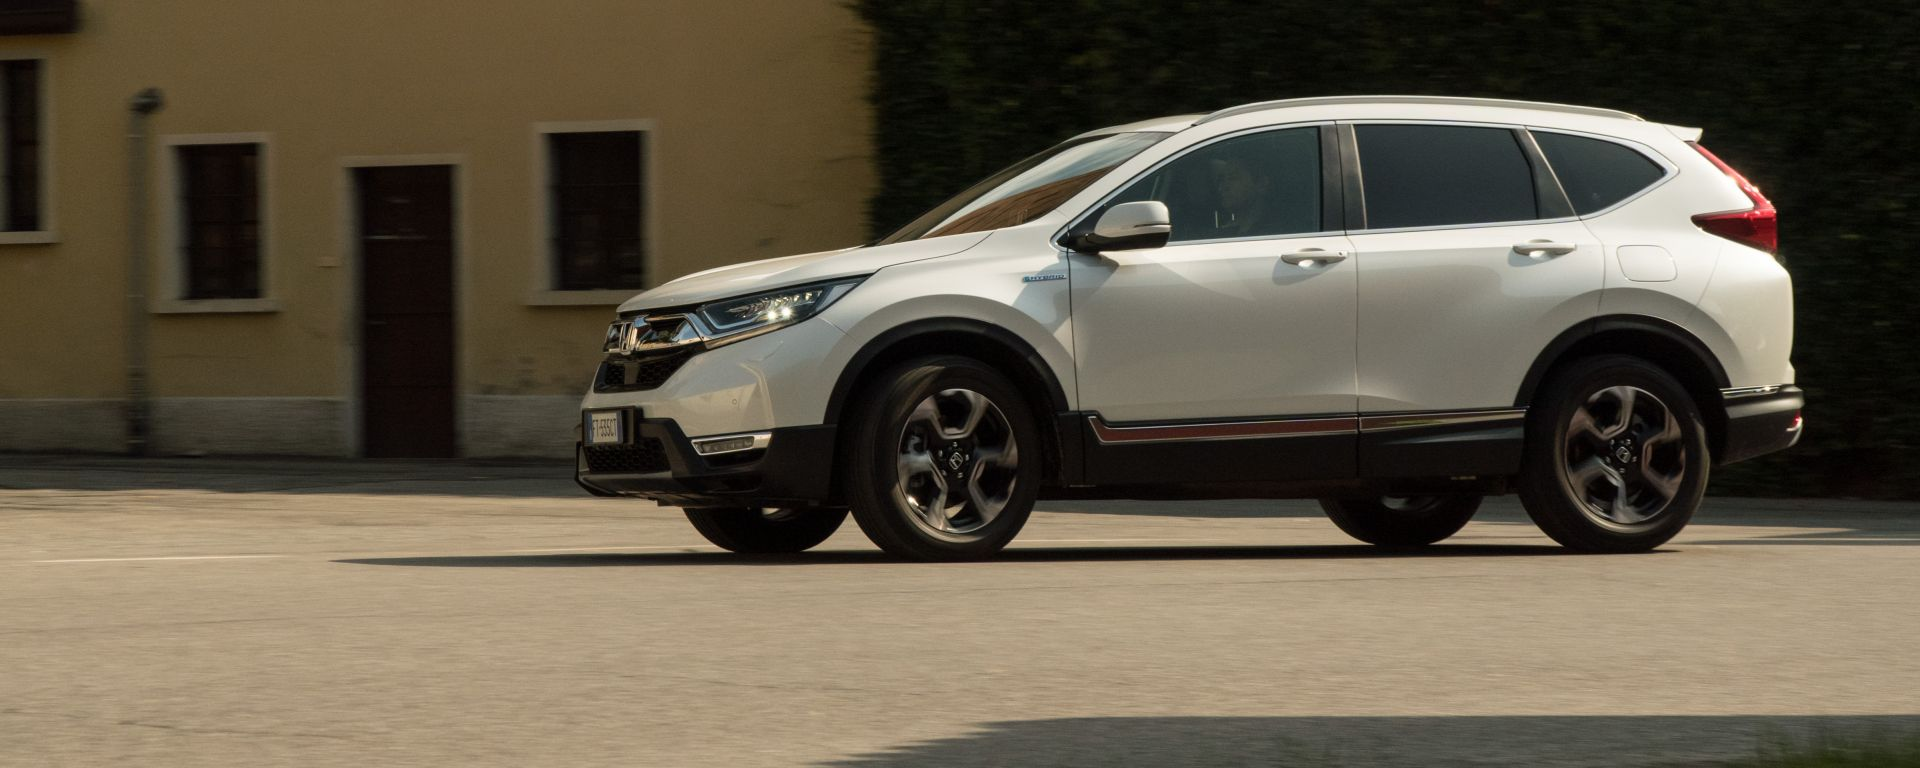 Honda CR-V Hybrid: passaggio laterale